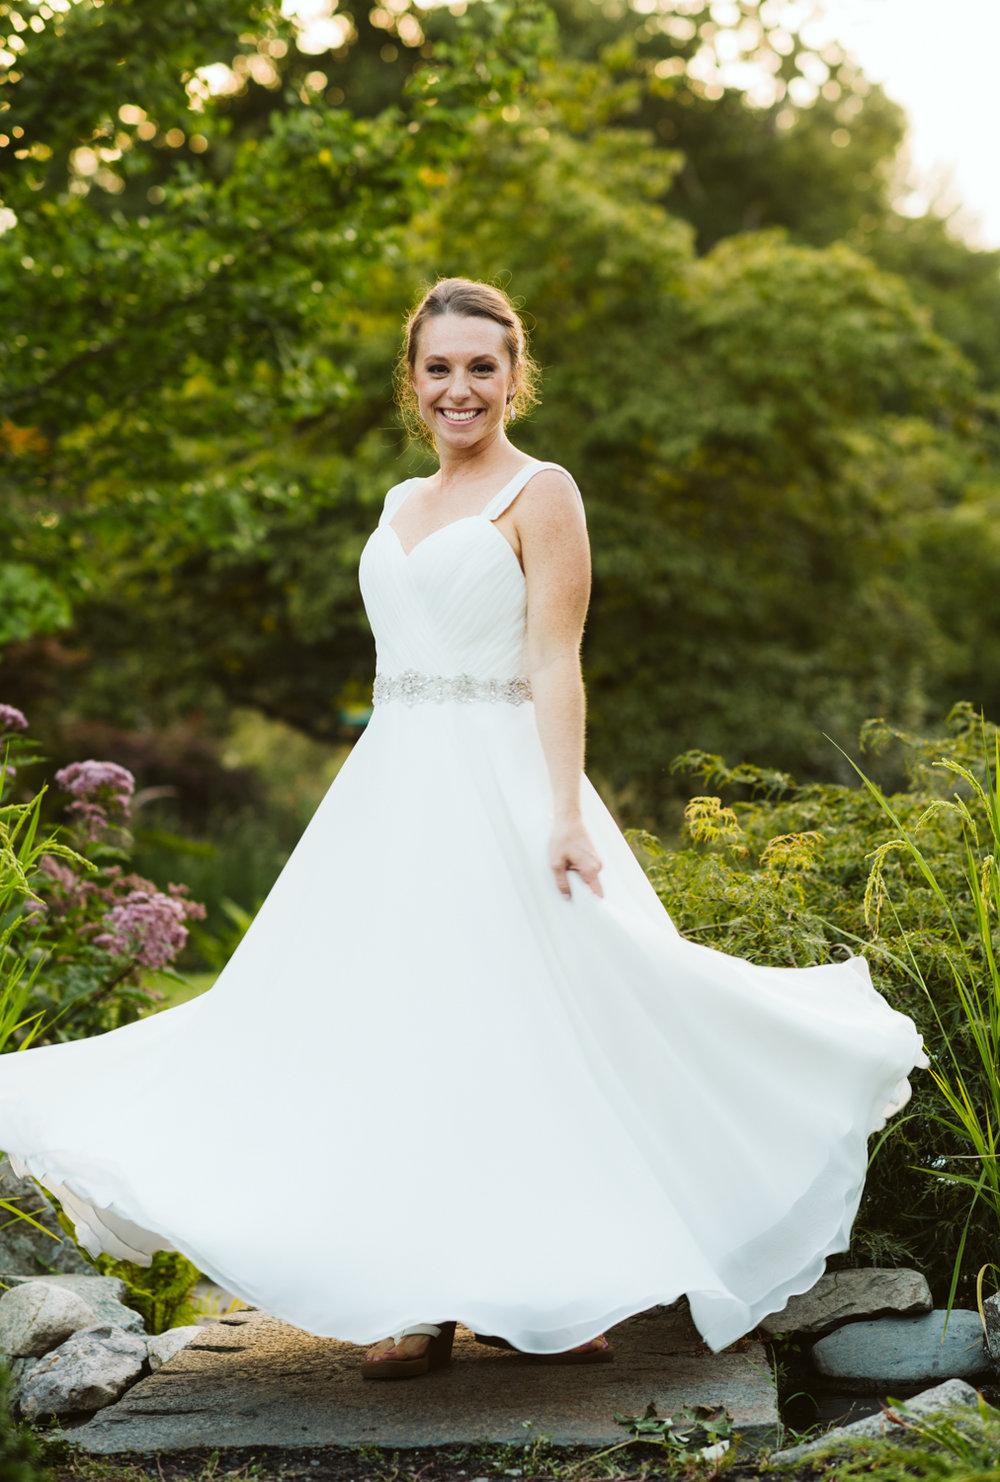 emily_alex_elm_bank_wedding_wellesley_DSC_8153.jpg